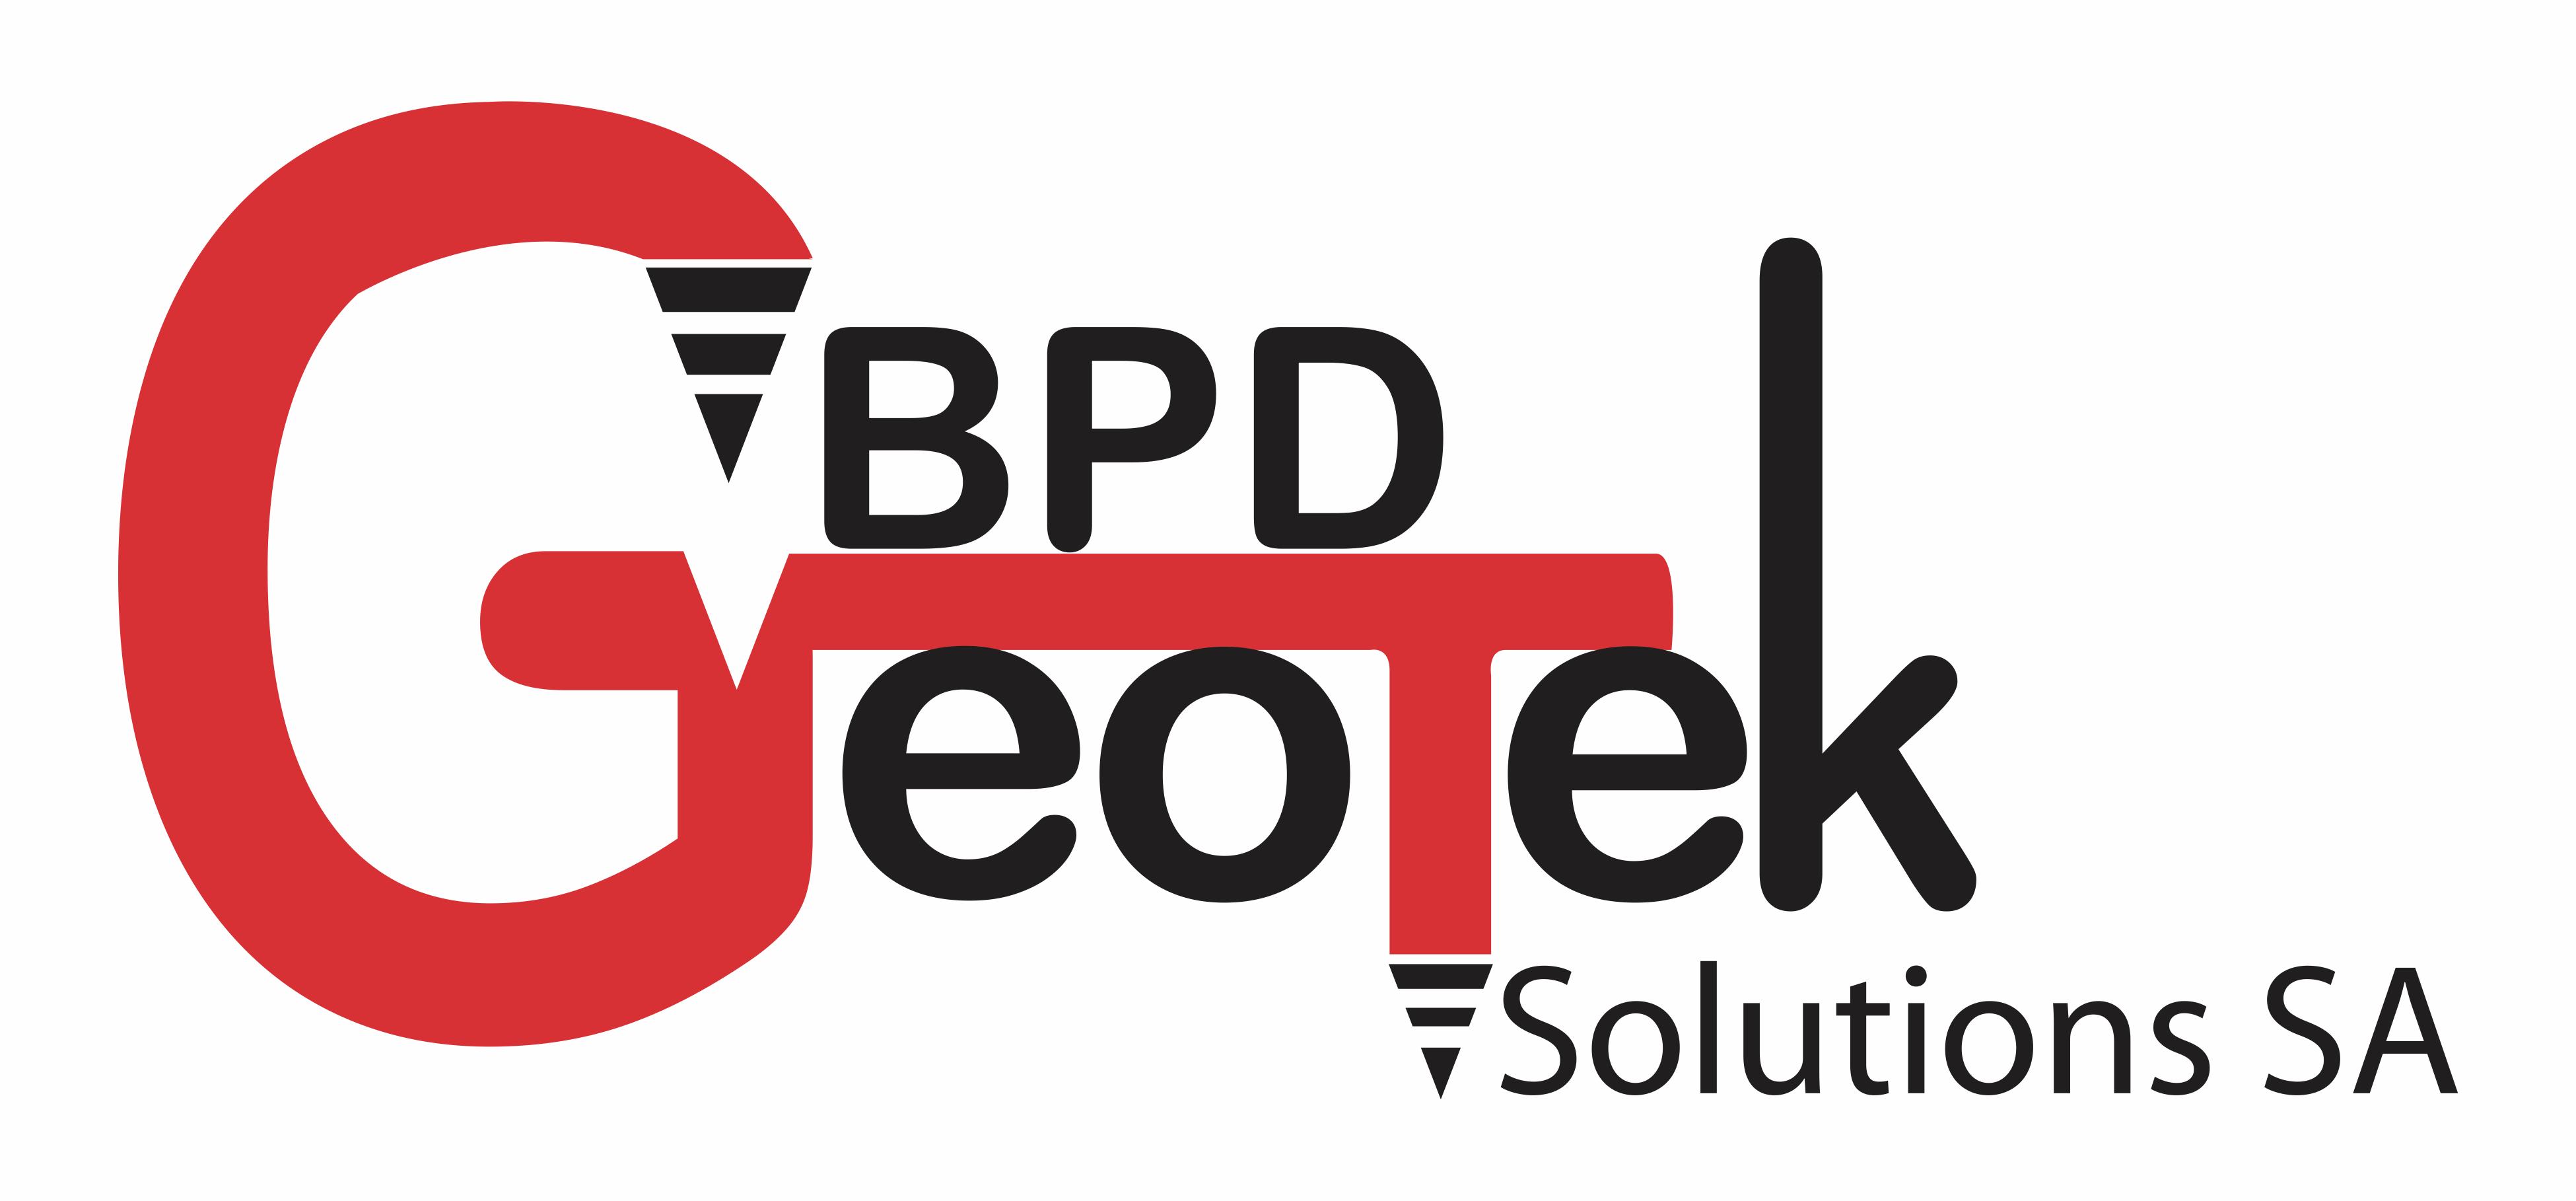 BPD Geotek Solutions SA